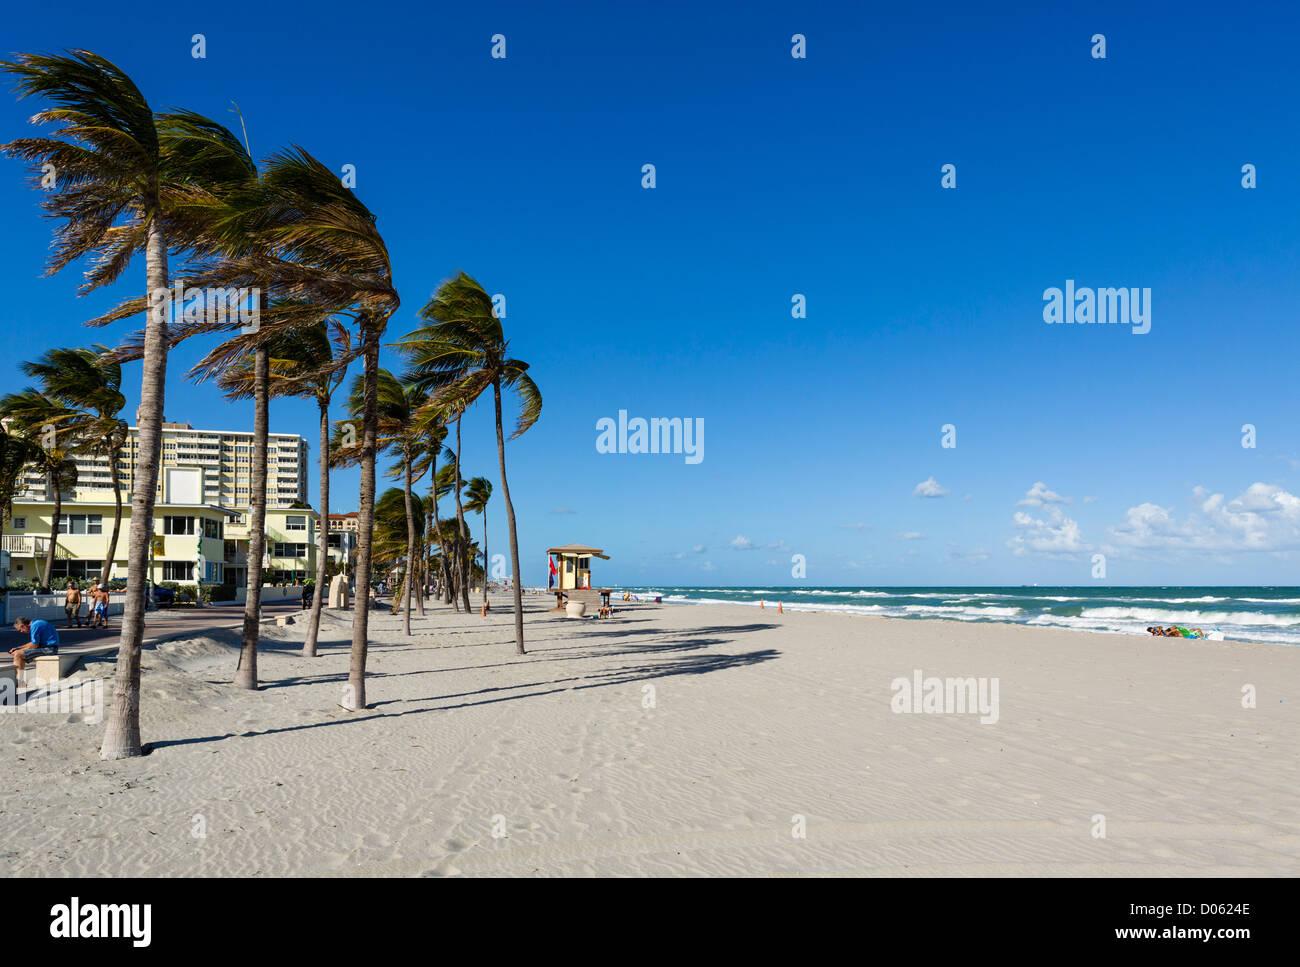 Strand in Hollywood, in der Nähe von Fort Lauderdale, Broward County, Gold Coast, Florida, USA Stockbild